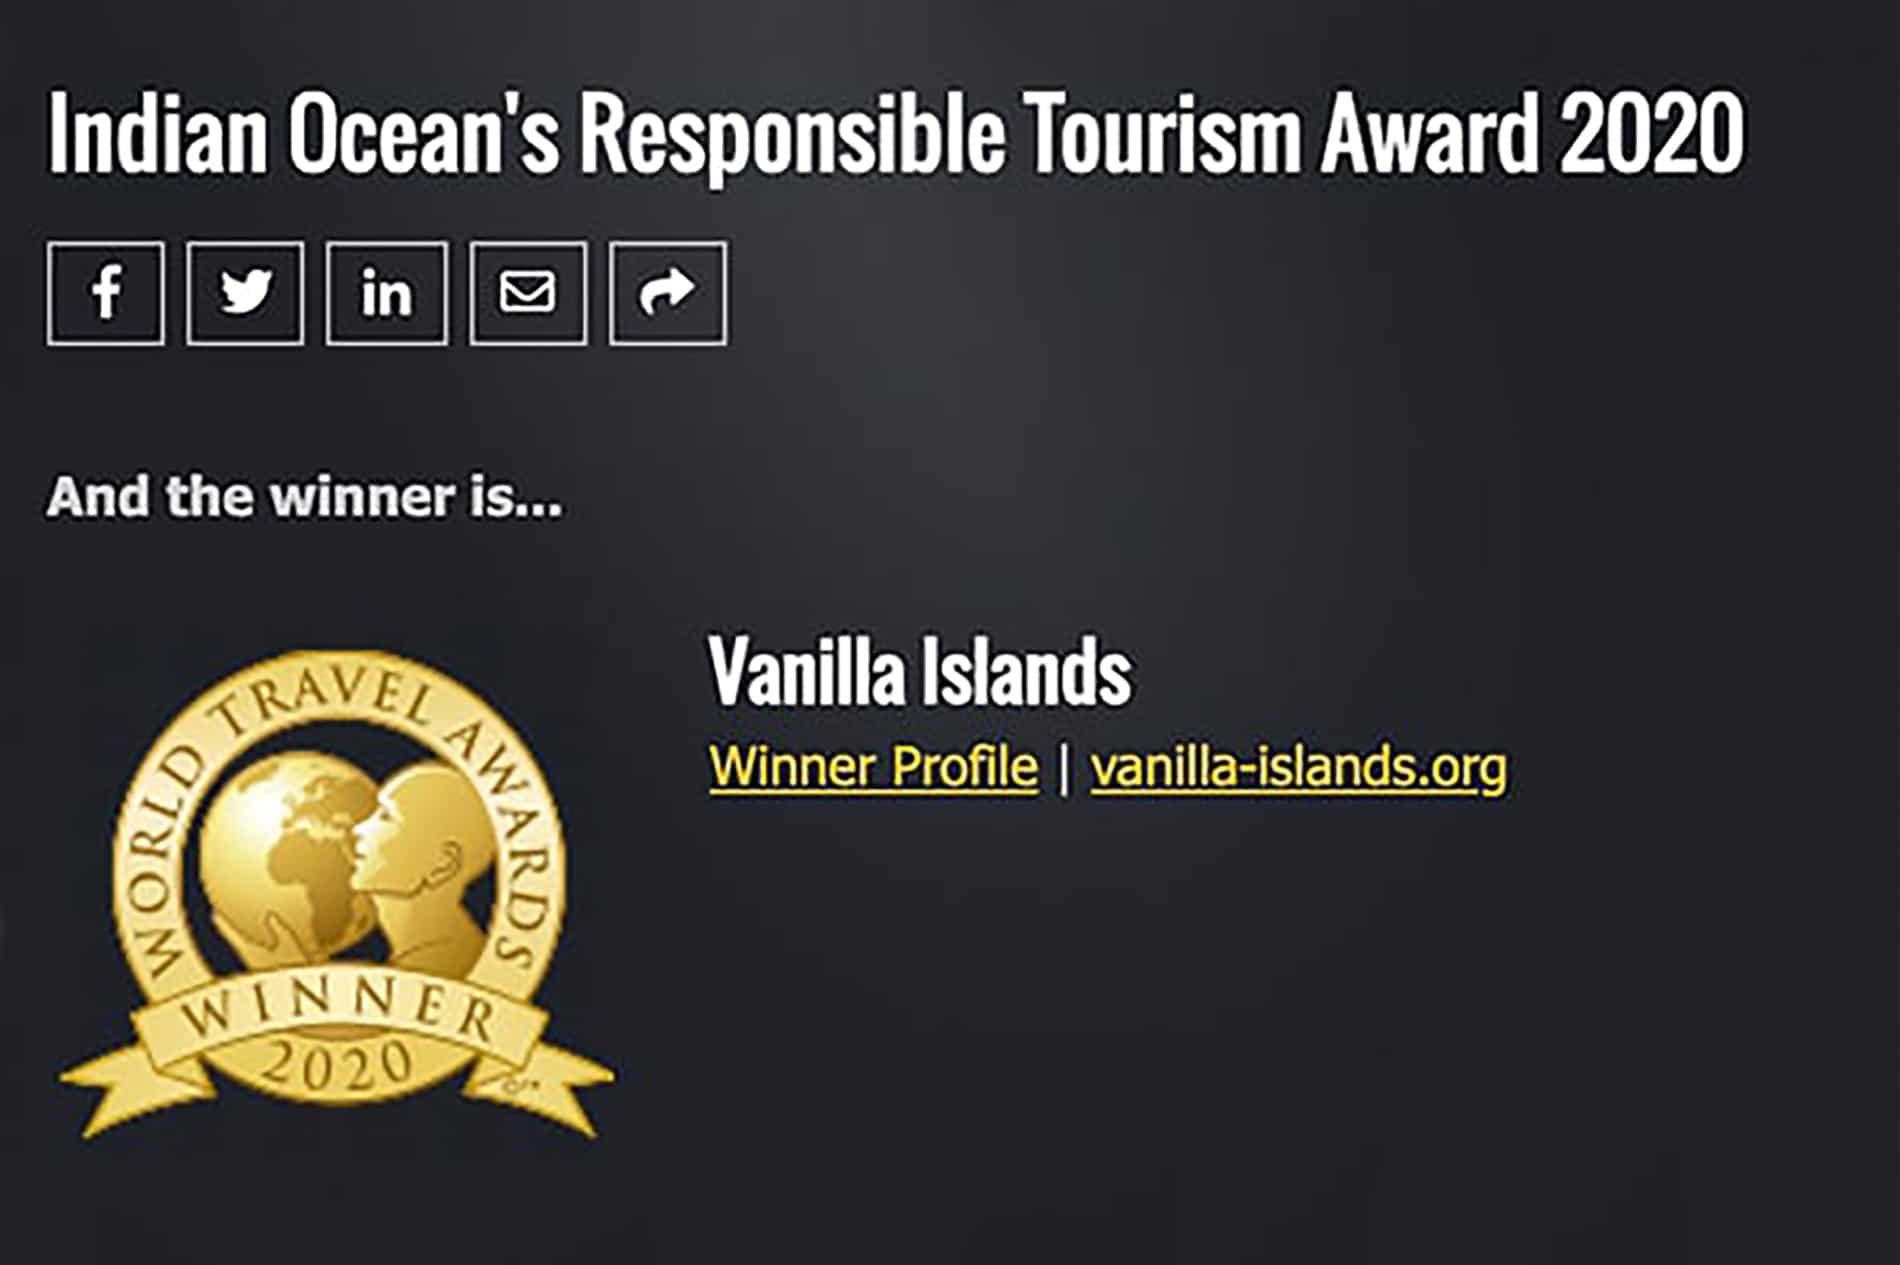 1er prix pour les Indian Ocean's Responsible Tourism Award 2020